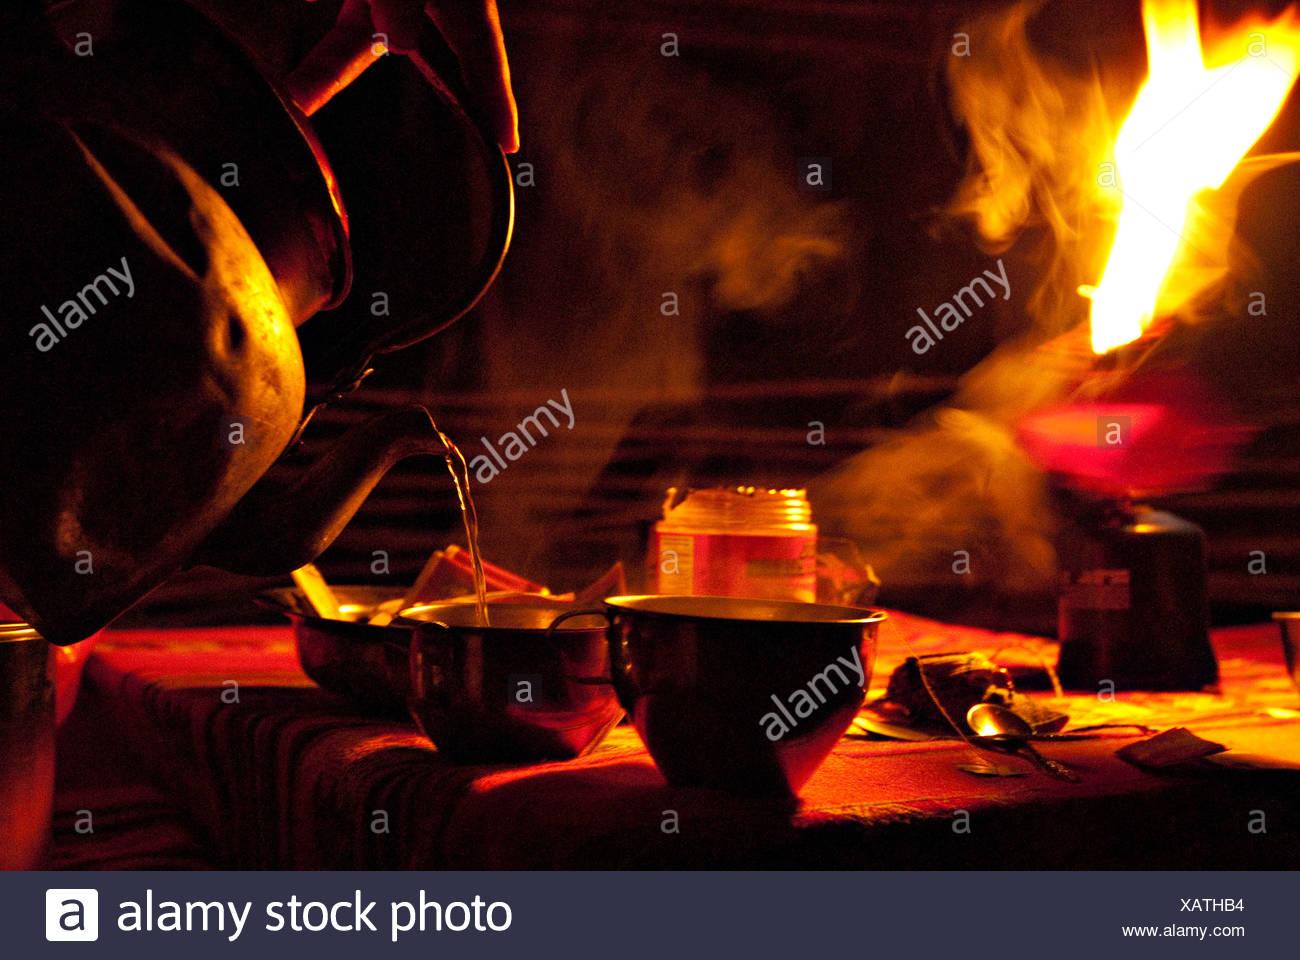 Camping Gas Stockfotos & Camping Gas Bilder - Alamy